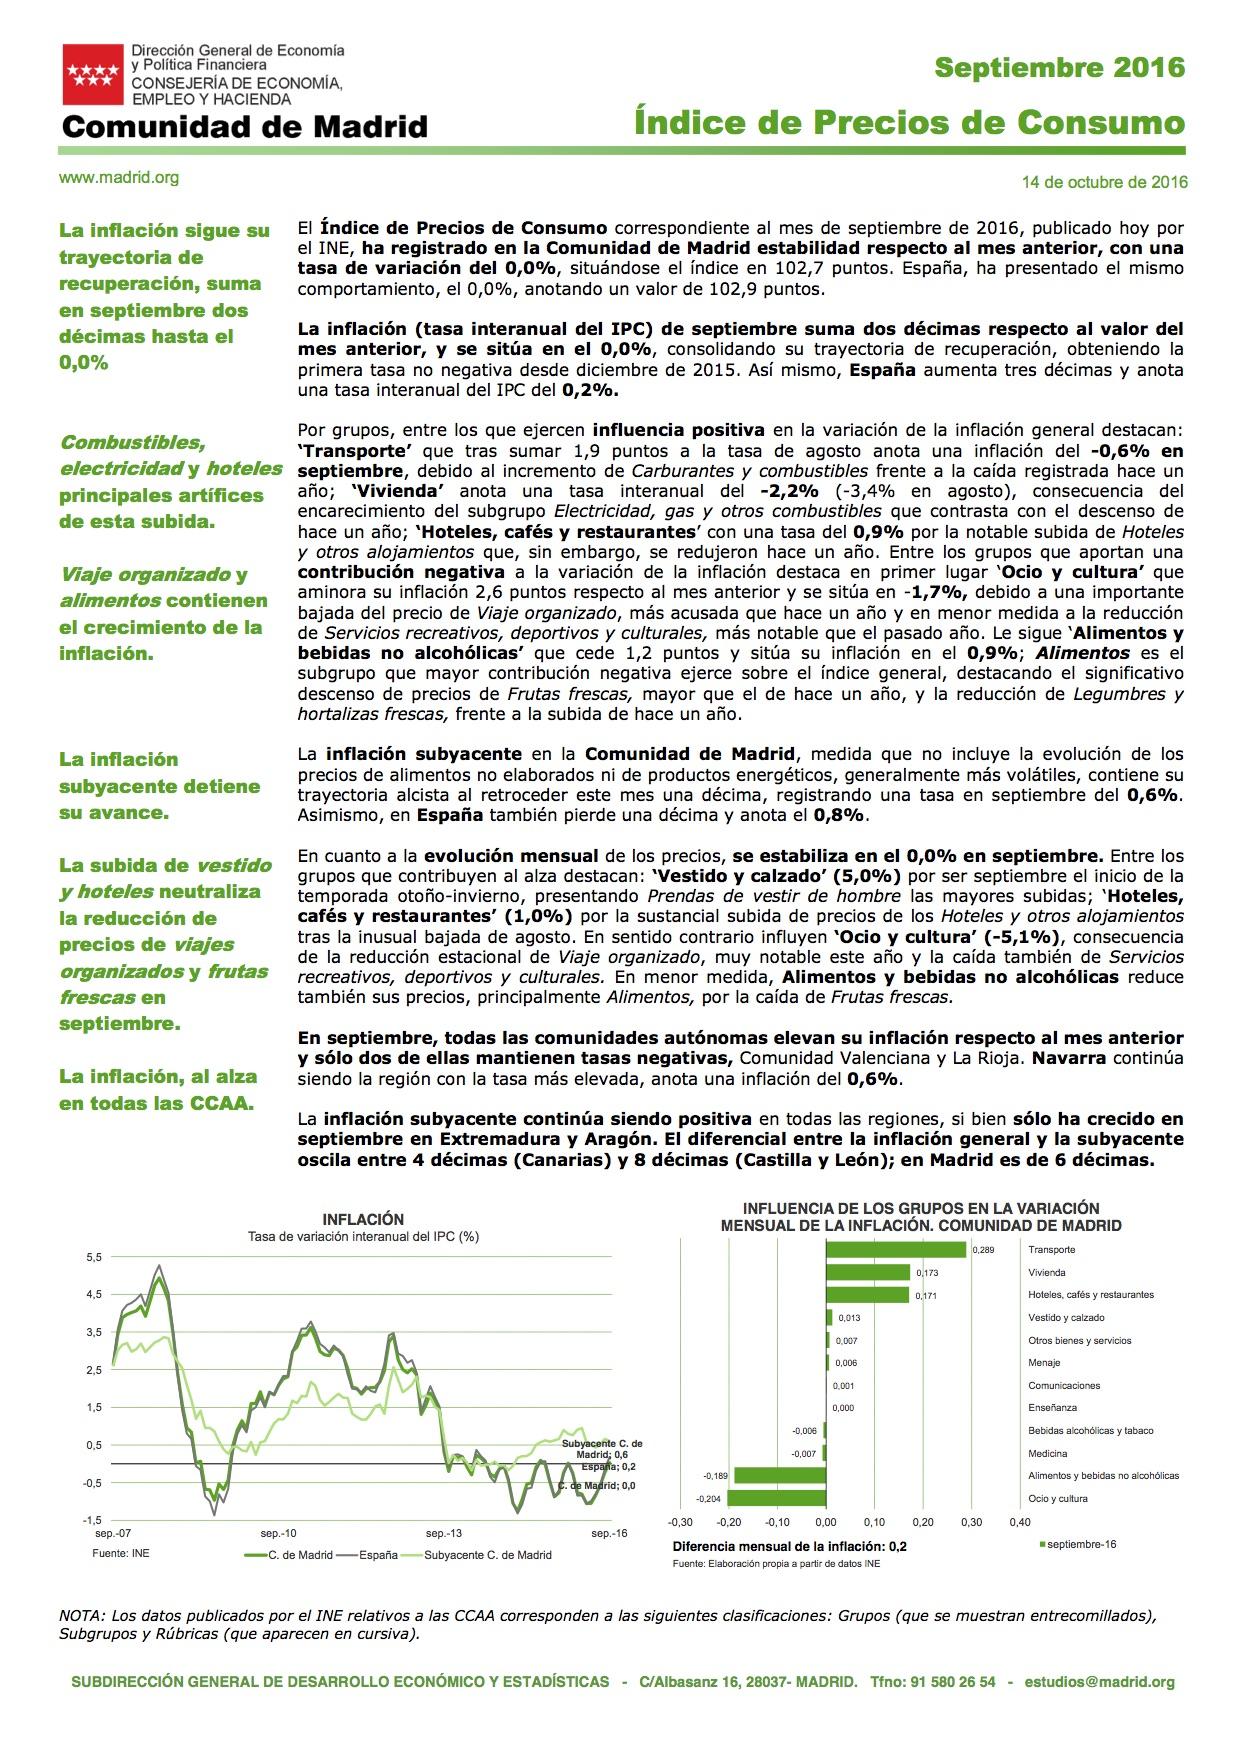 nota2-ipc-septiembre-2016-comunidad-de-madrid